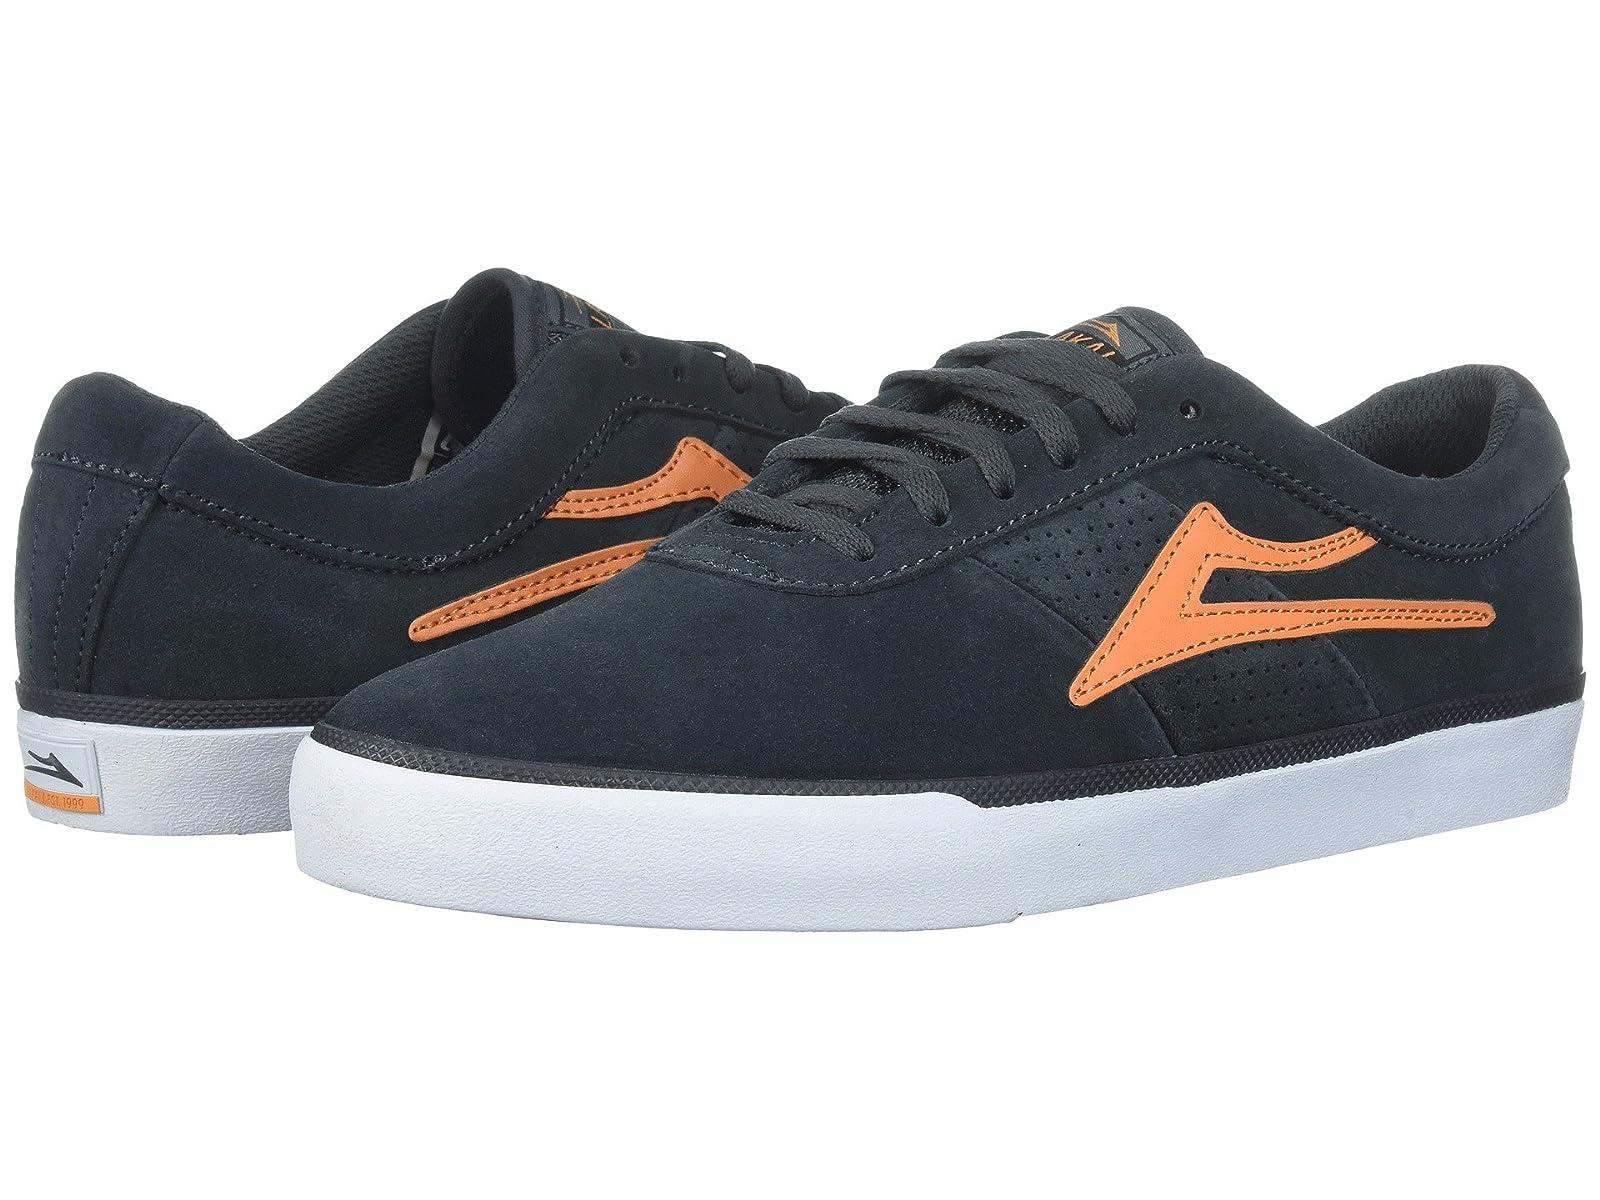 Lakai SheffieldCheap and distinctive eye-catching shoes